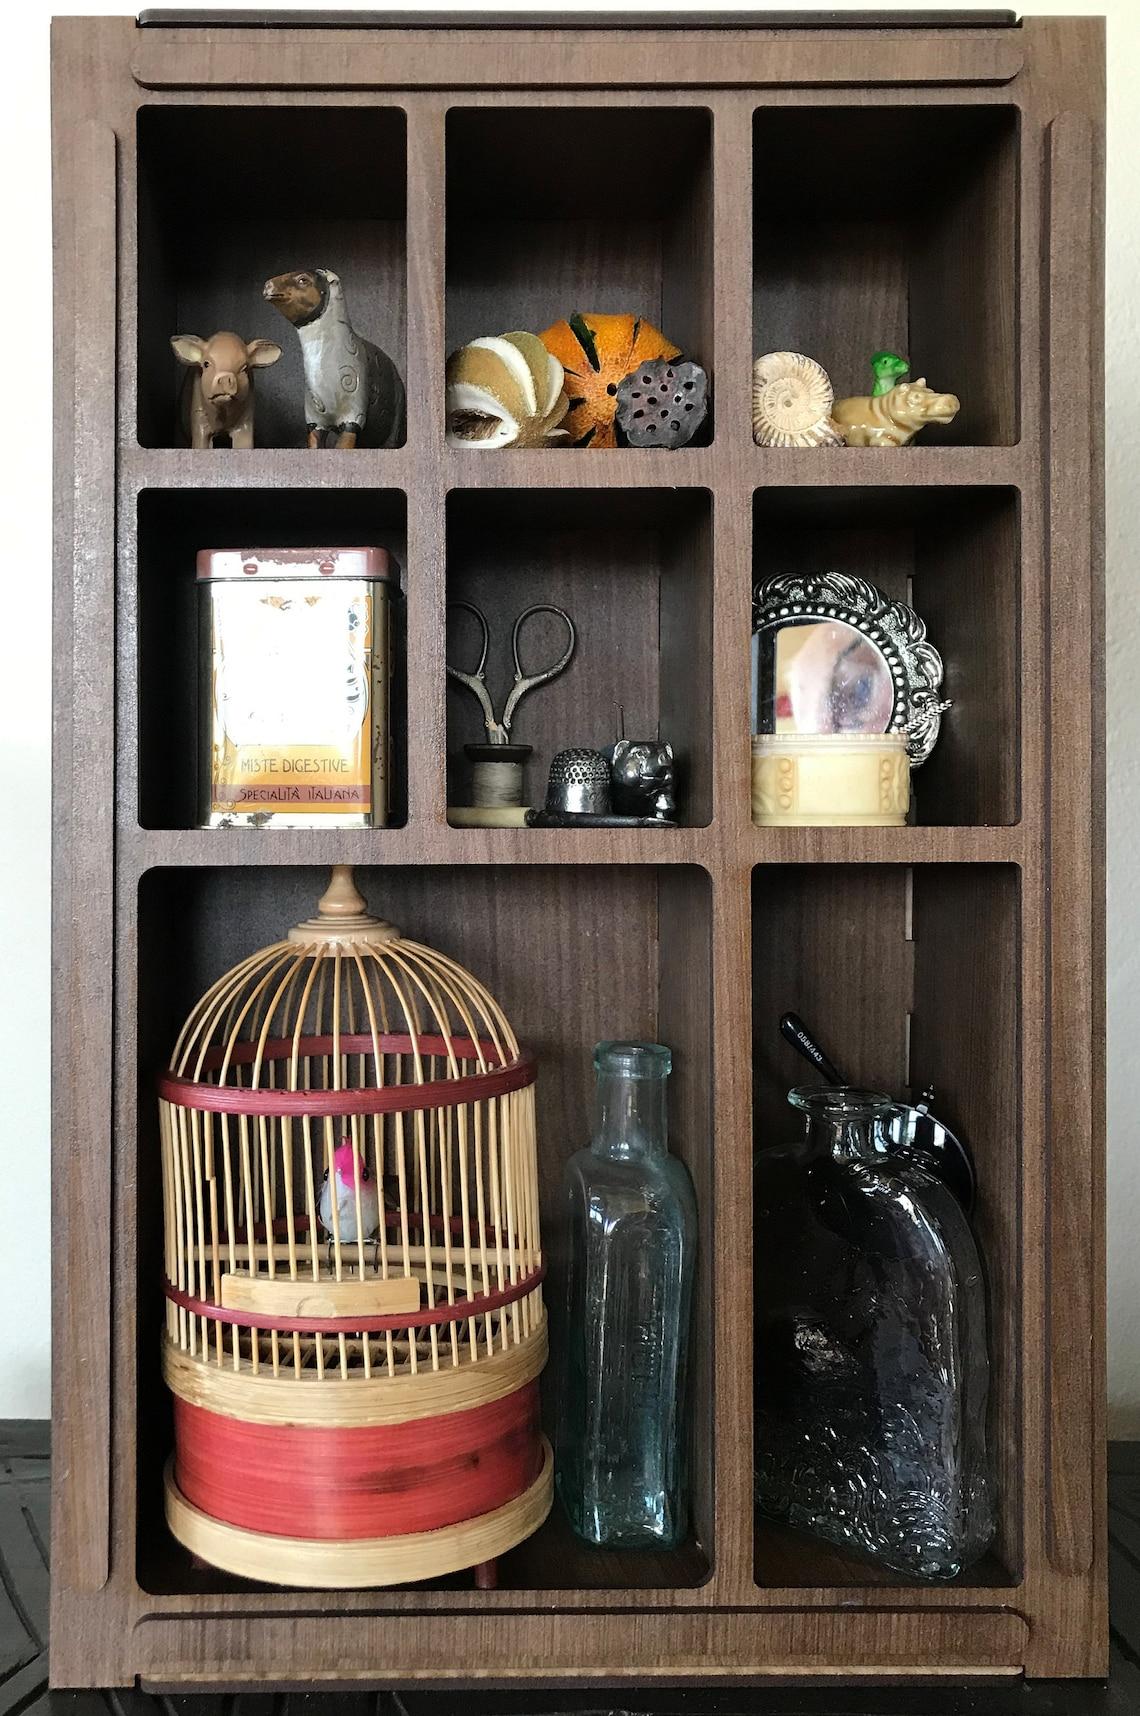 Art Deco Style Curiosity Cabinet for Your Curiosities, Keepsakes and Objets d'art